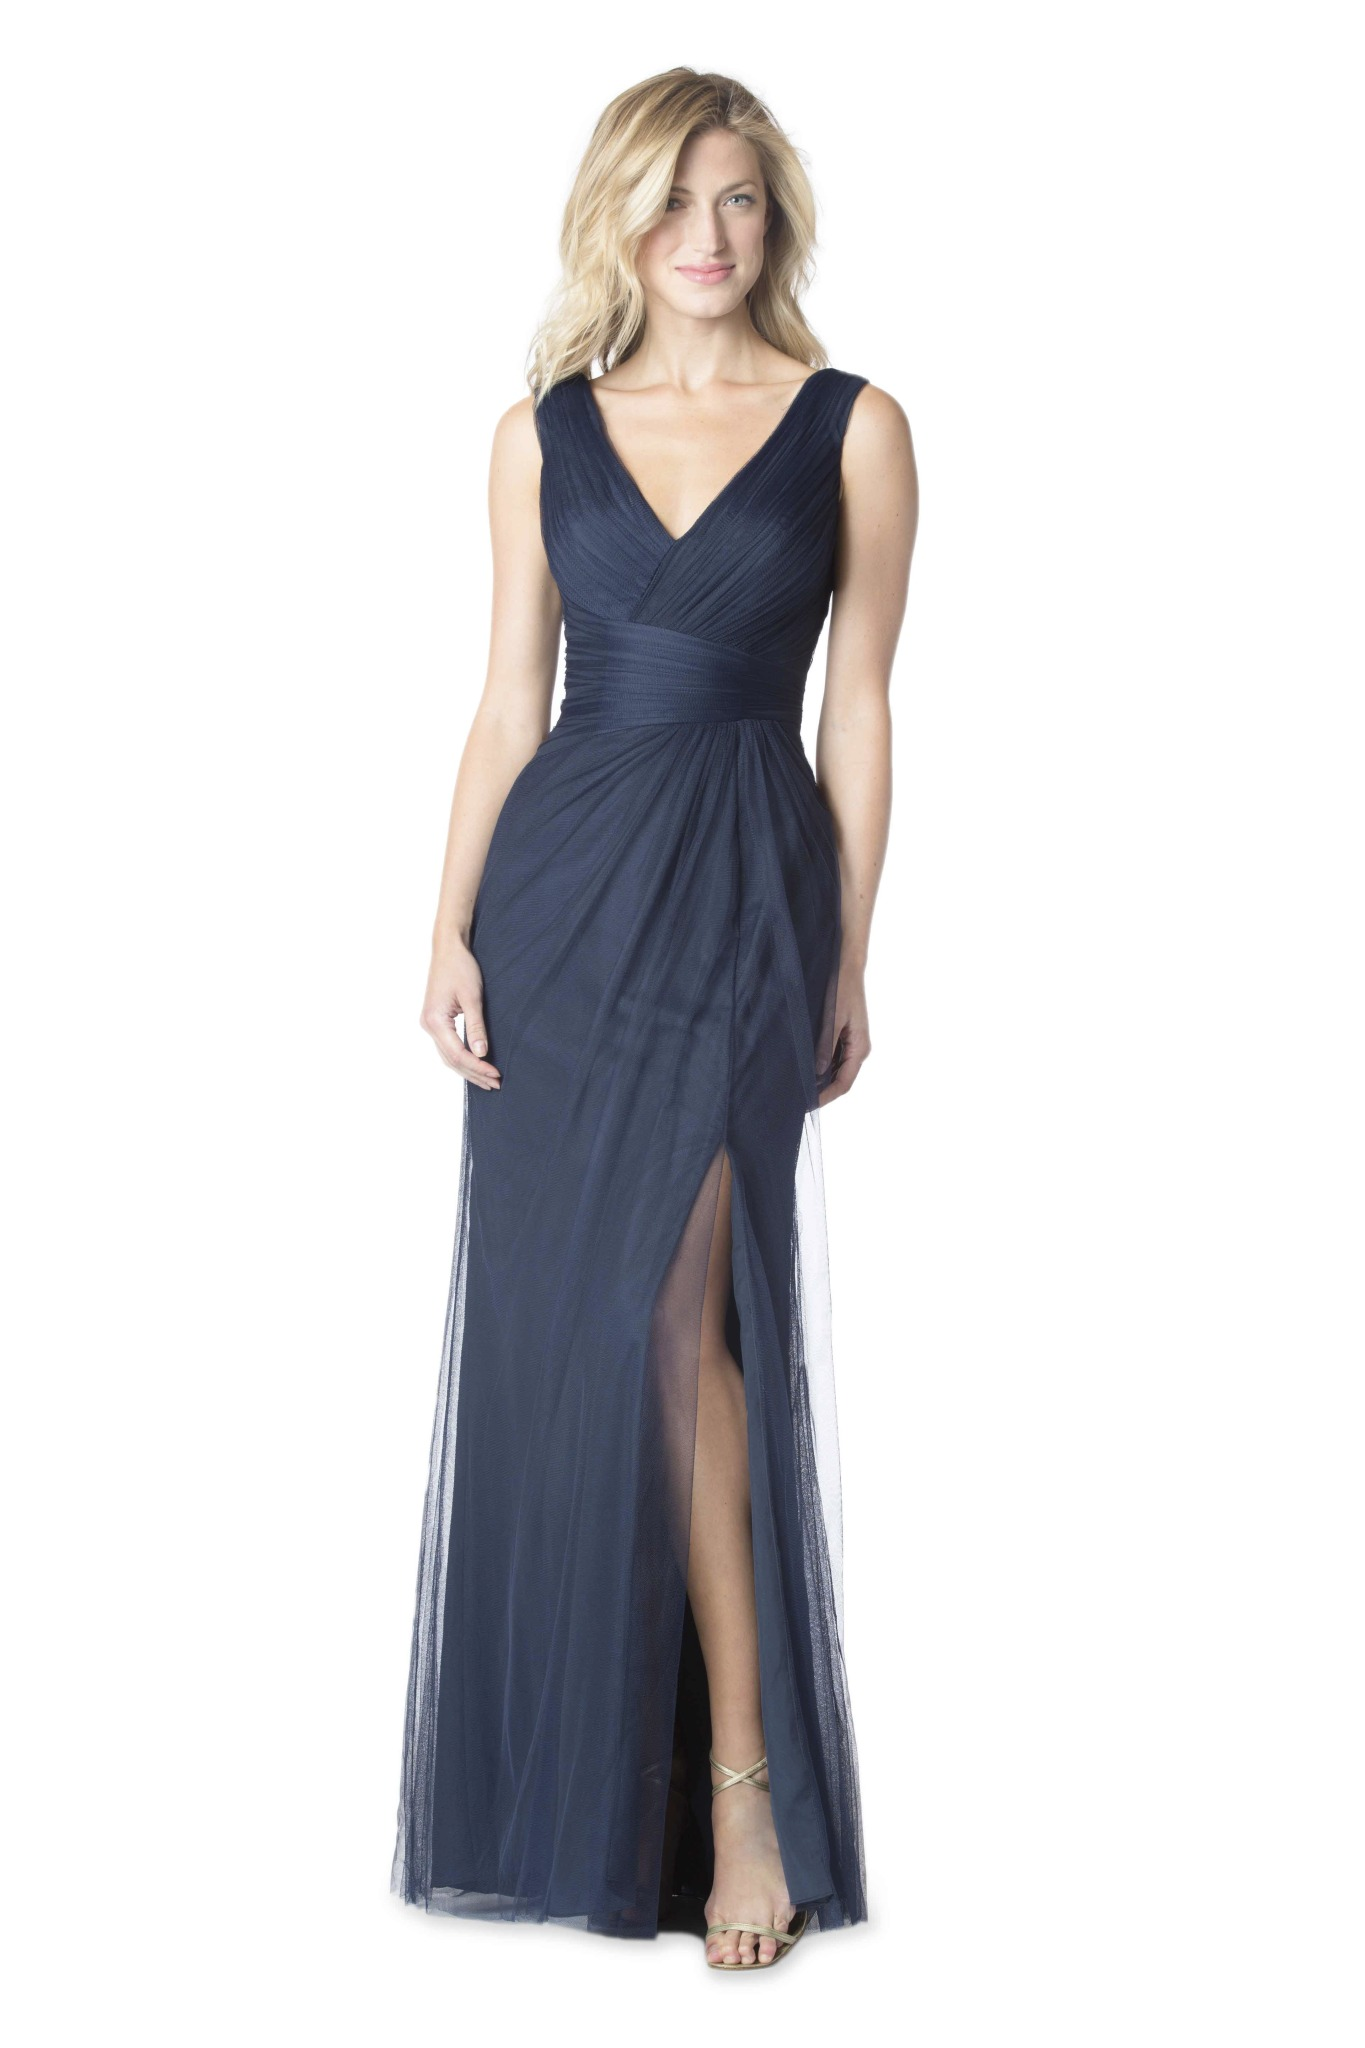 24e73cdae90d high neck bridesmaid dresses Archives ⋆ Precious Memories Bridal Shop